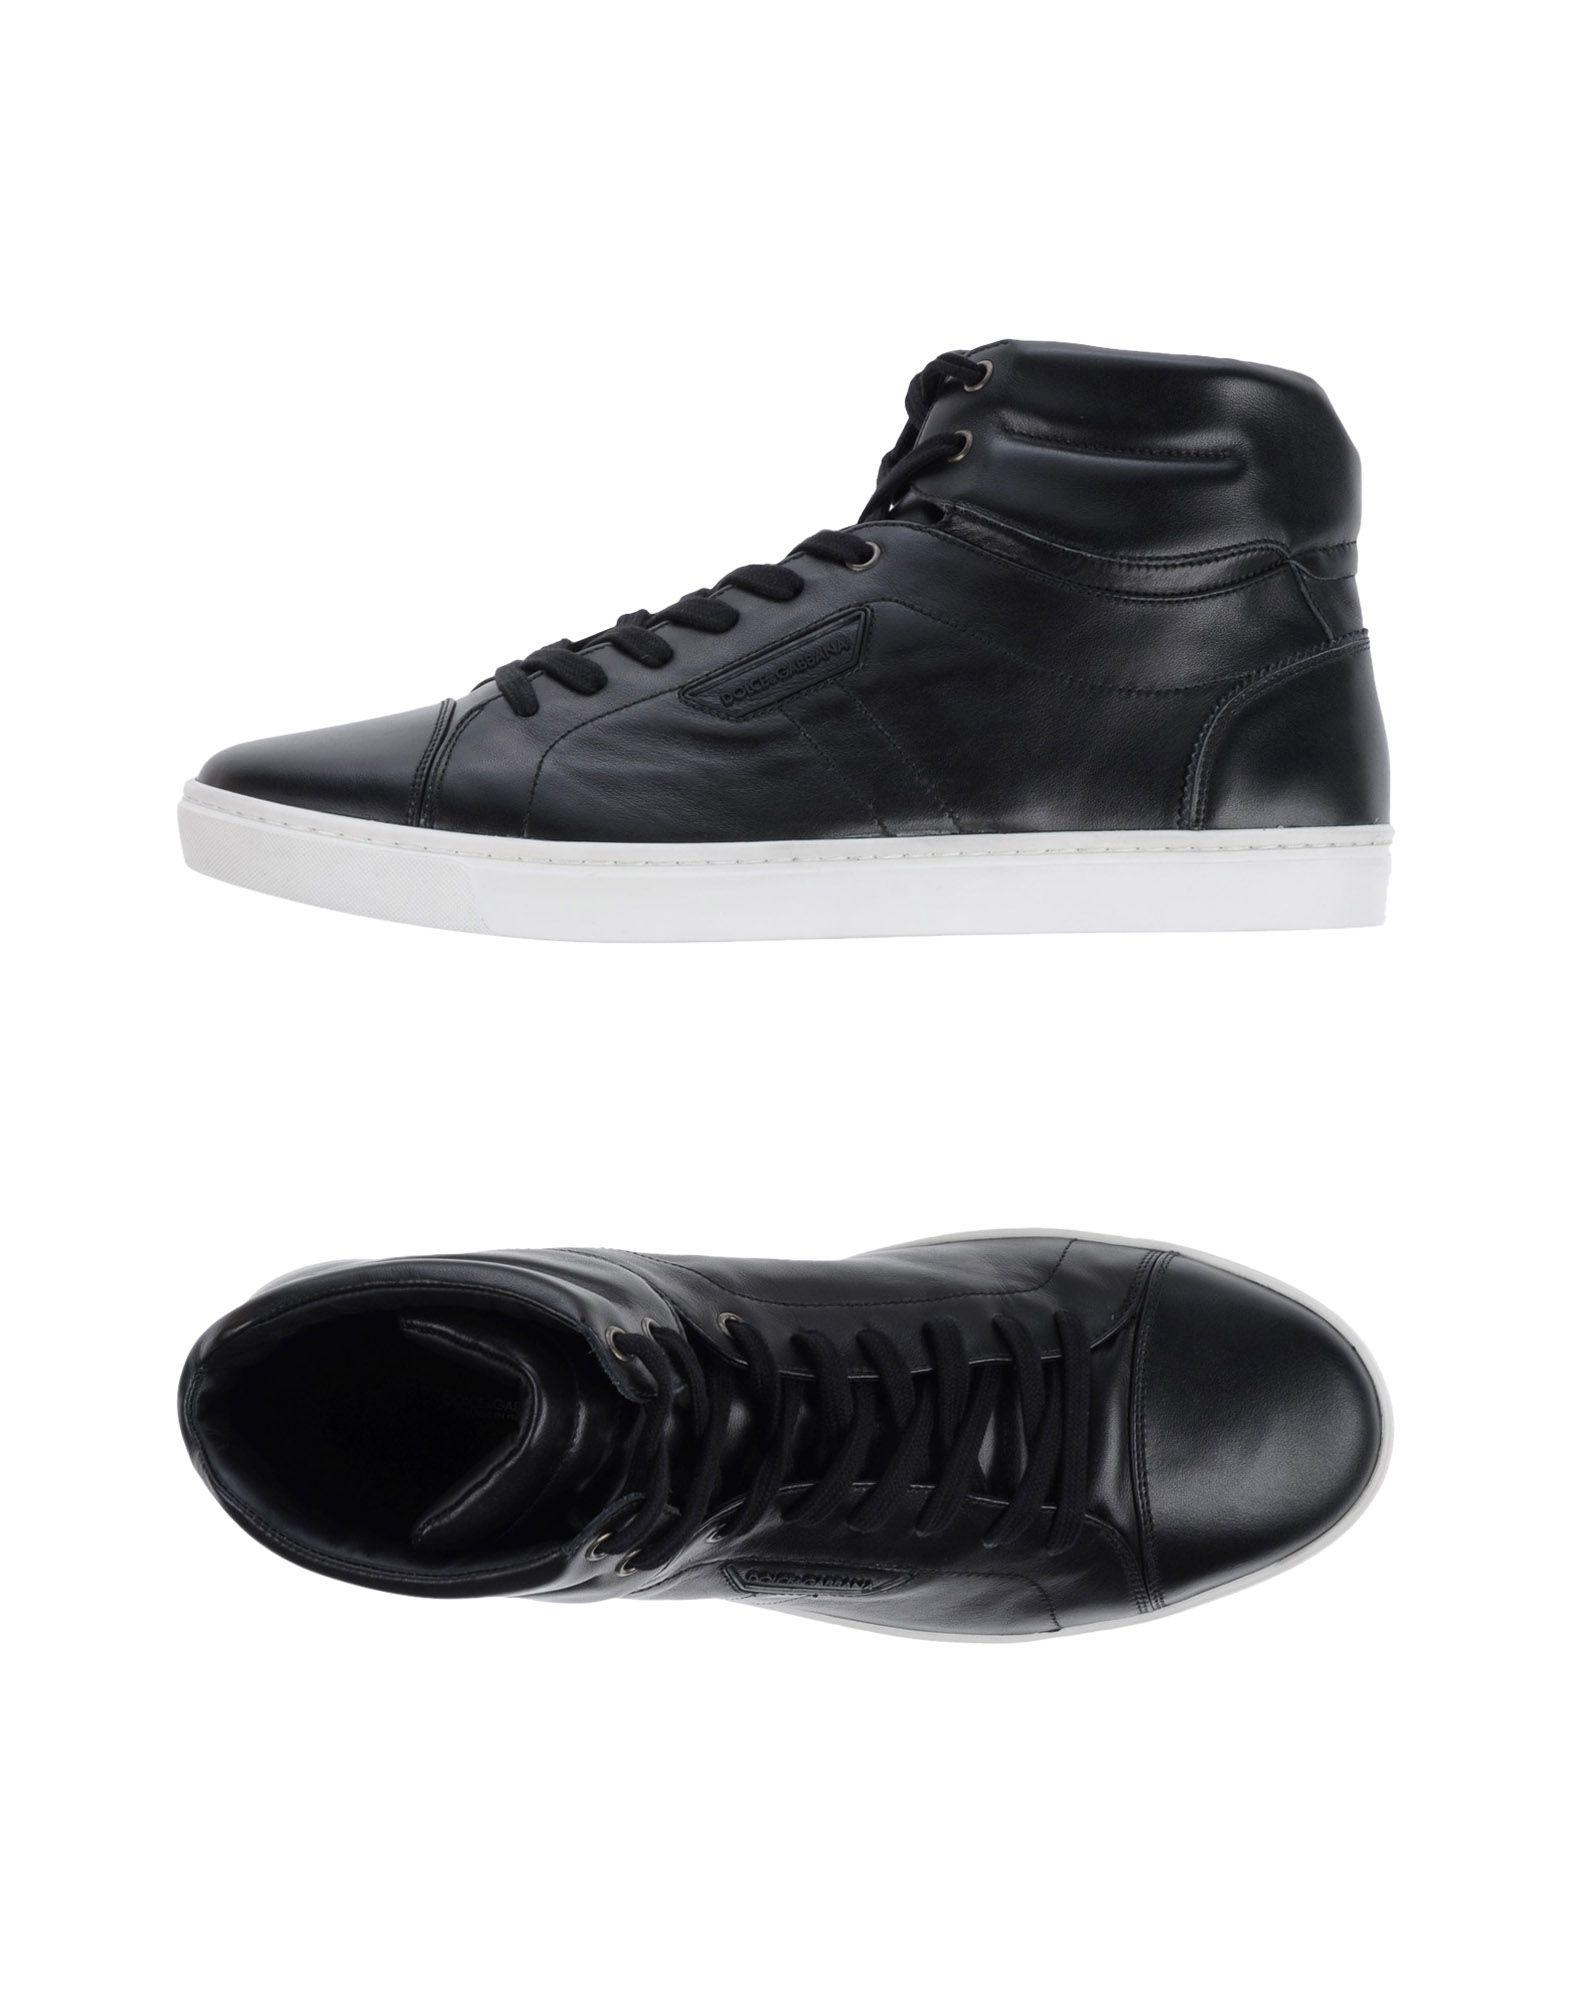 Dolce & Gabbana Sneakers Herren  11170283LQ Gute Qualität beliebte Schuhe